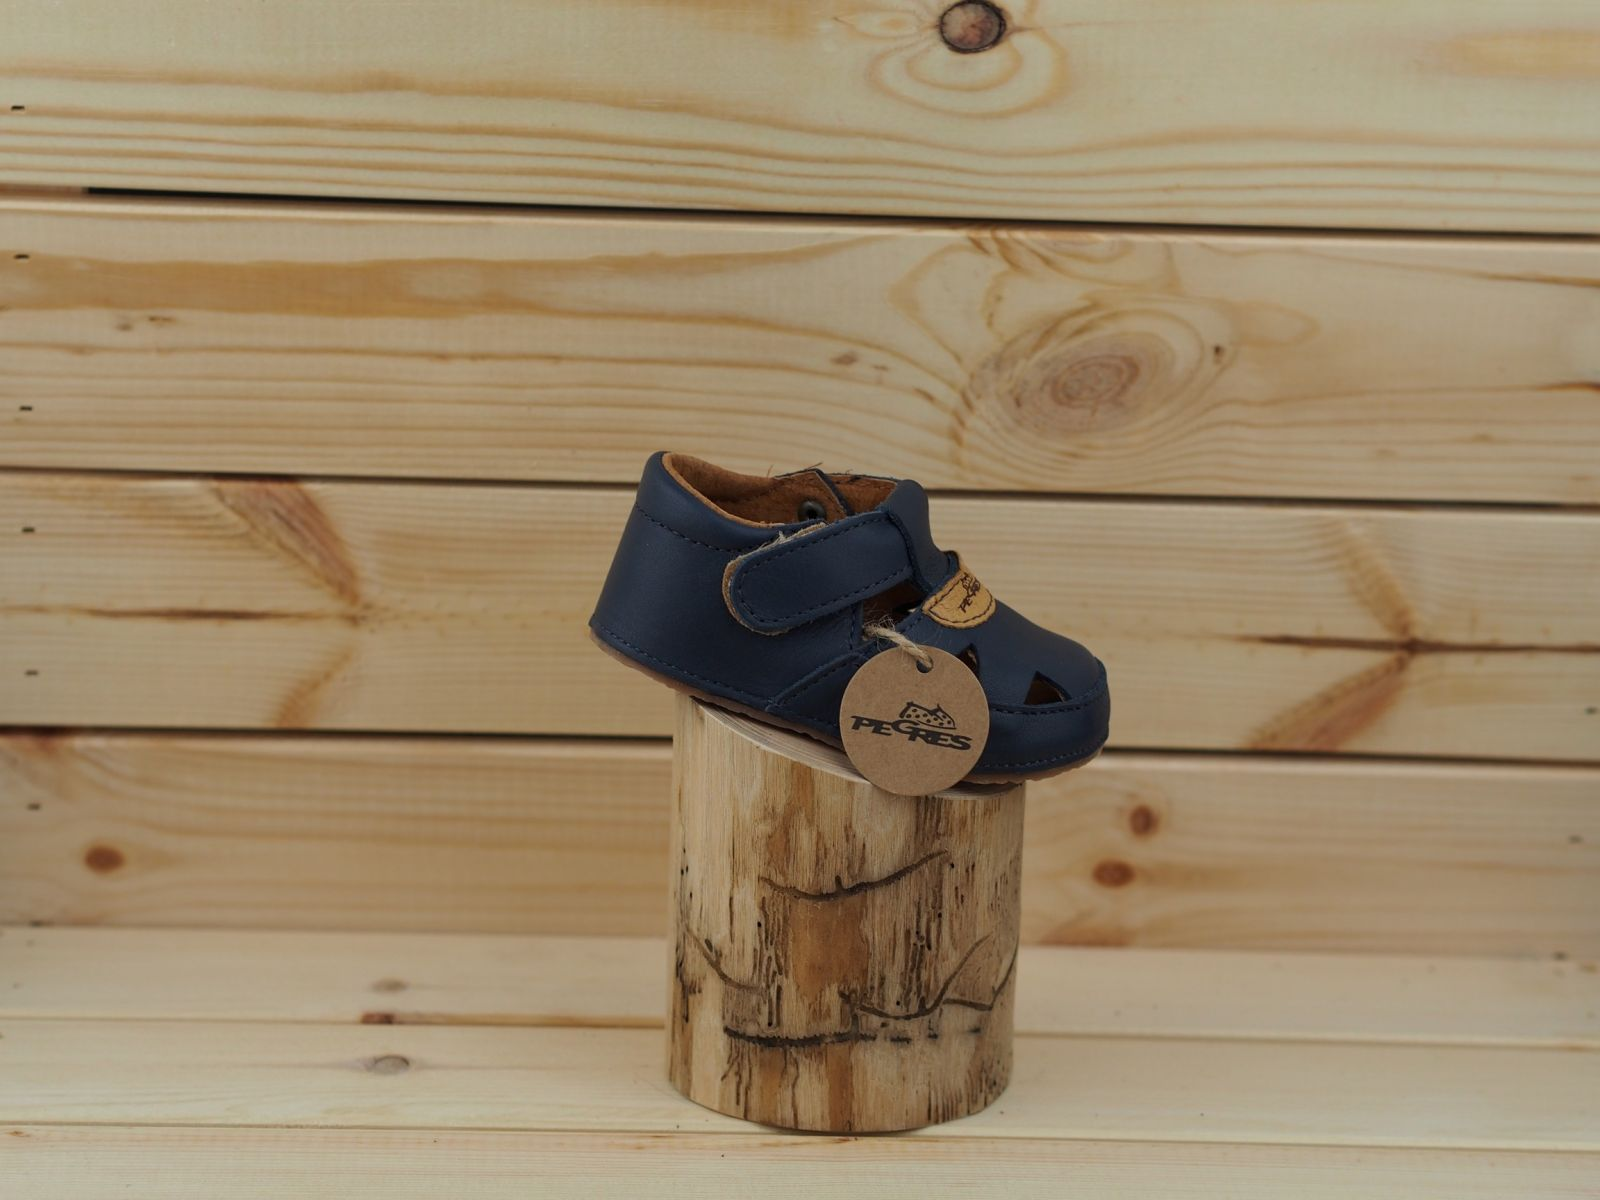 Barefoot Bosé Pegresky sandály 1096 modrá bosá